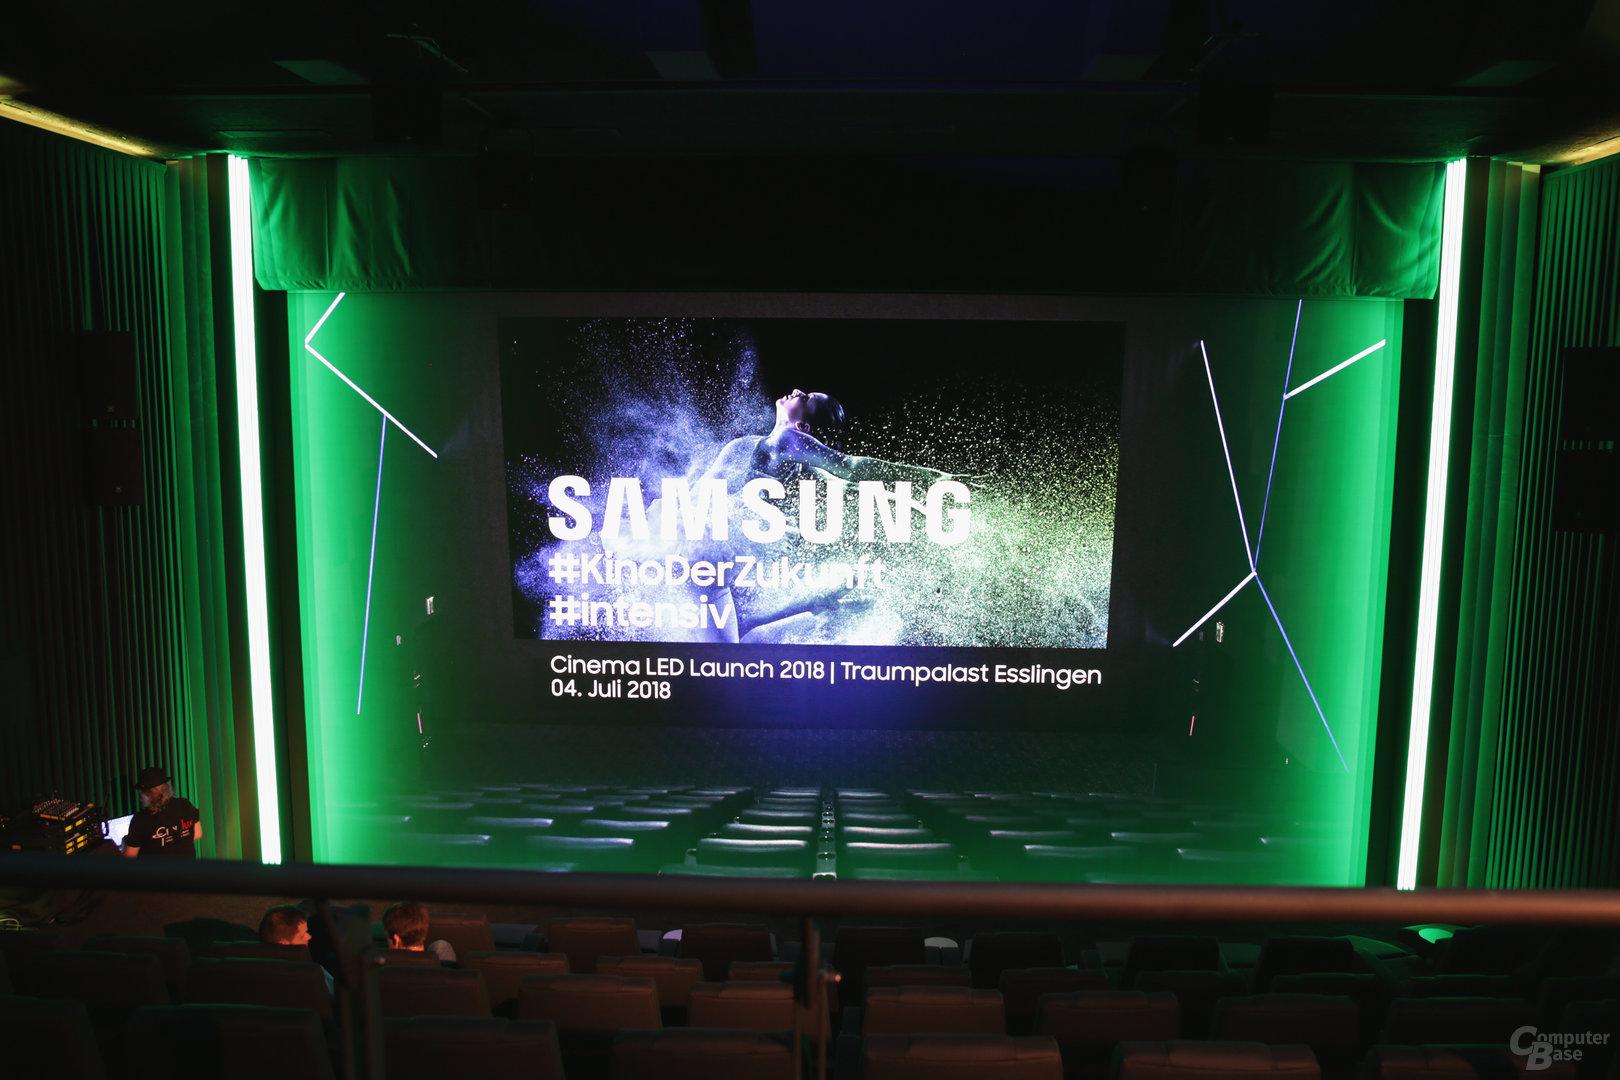 Der Cinema-LED-Saal im Traumpalast Esslingen